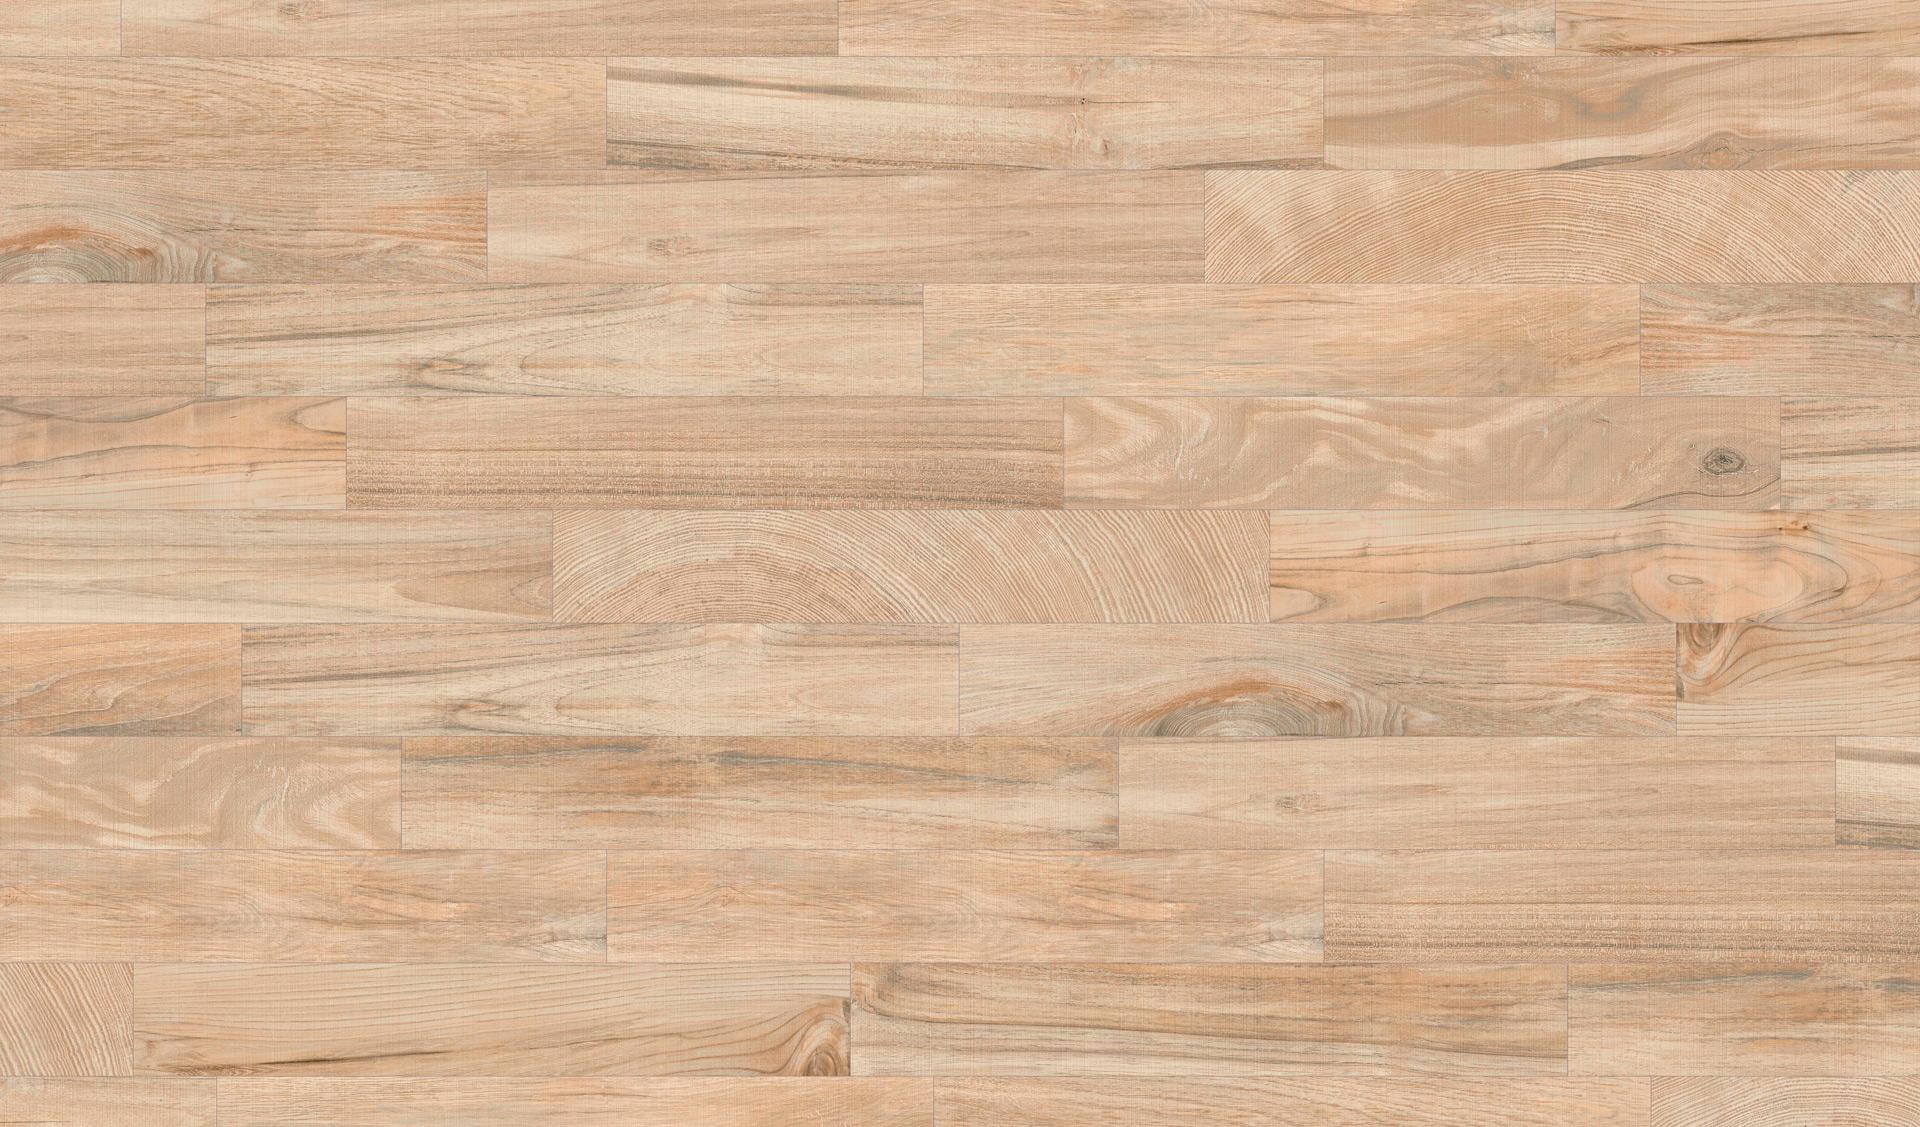 Vives floor tiles porcelain gamma 144x893 gamma r beige dailygadgetfo Images